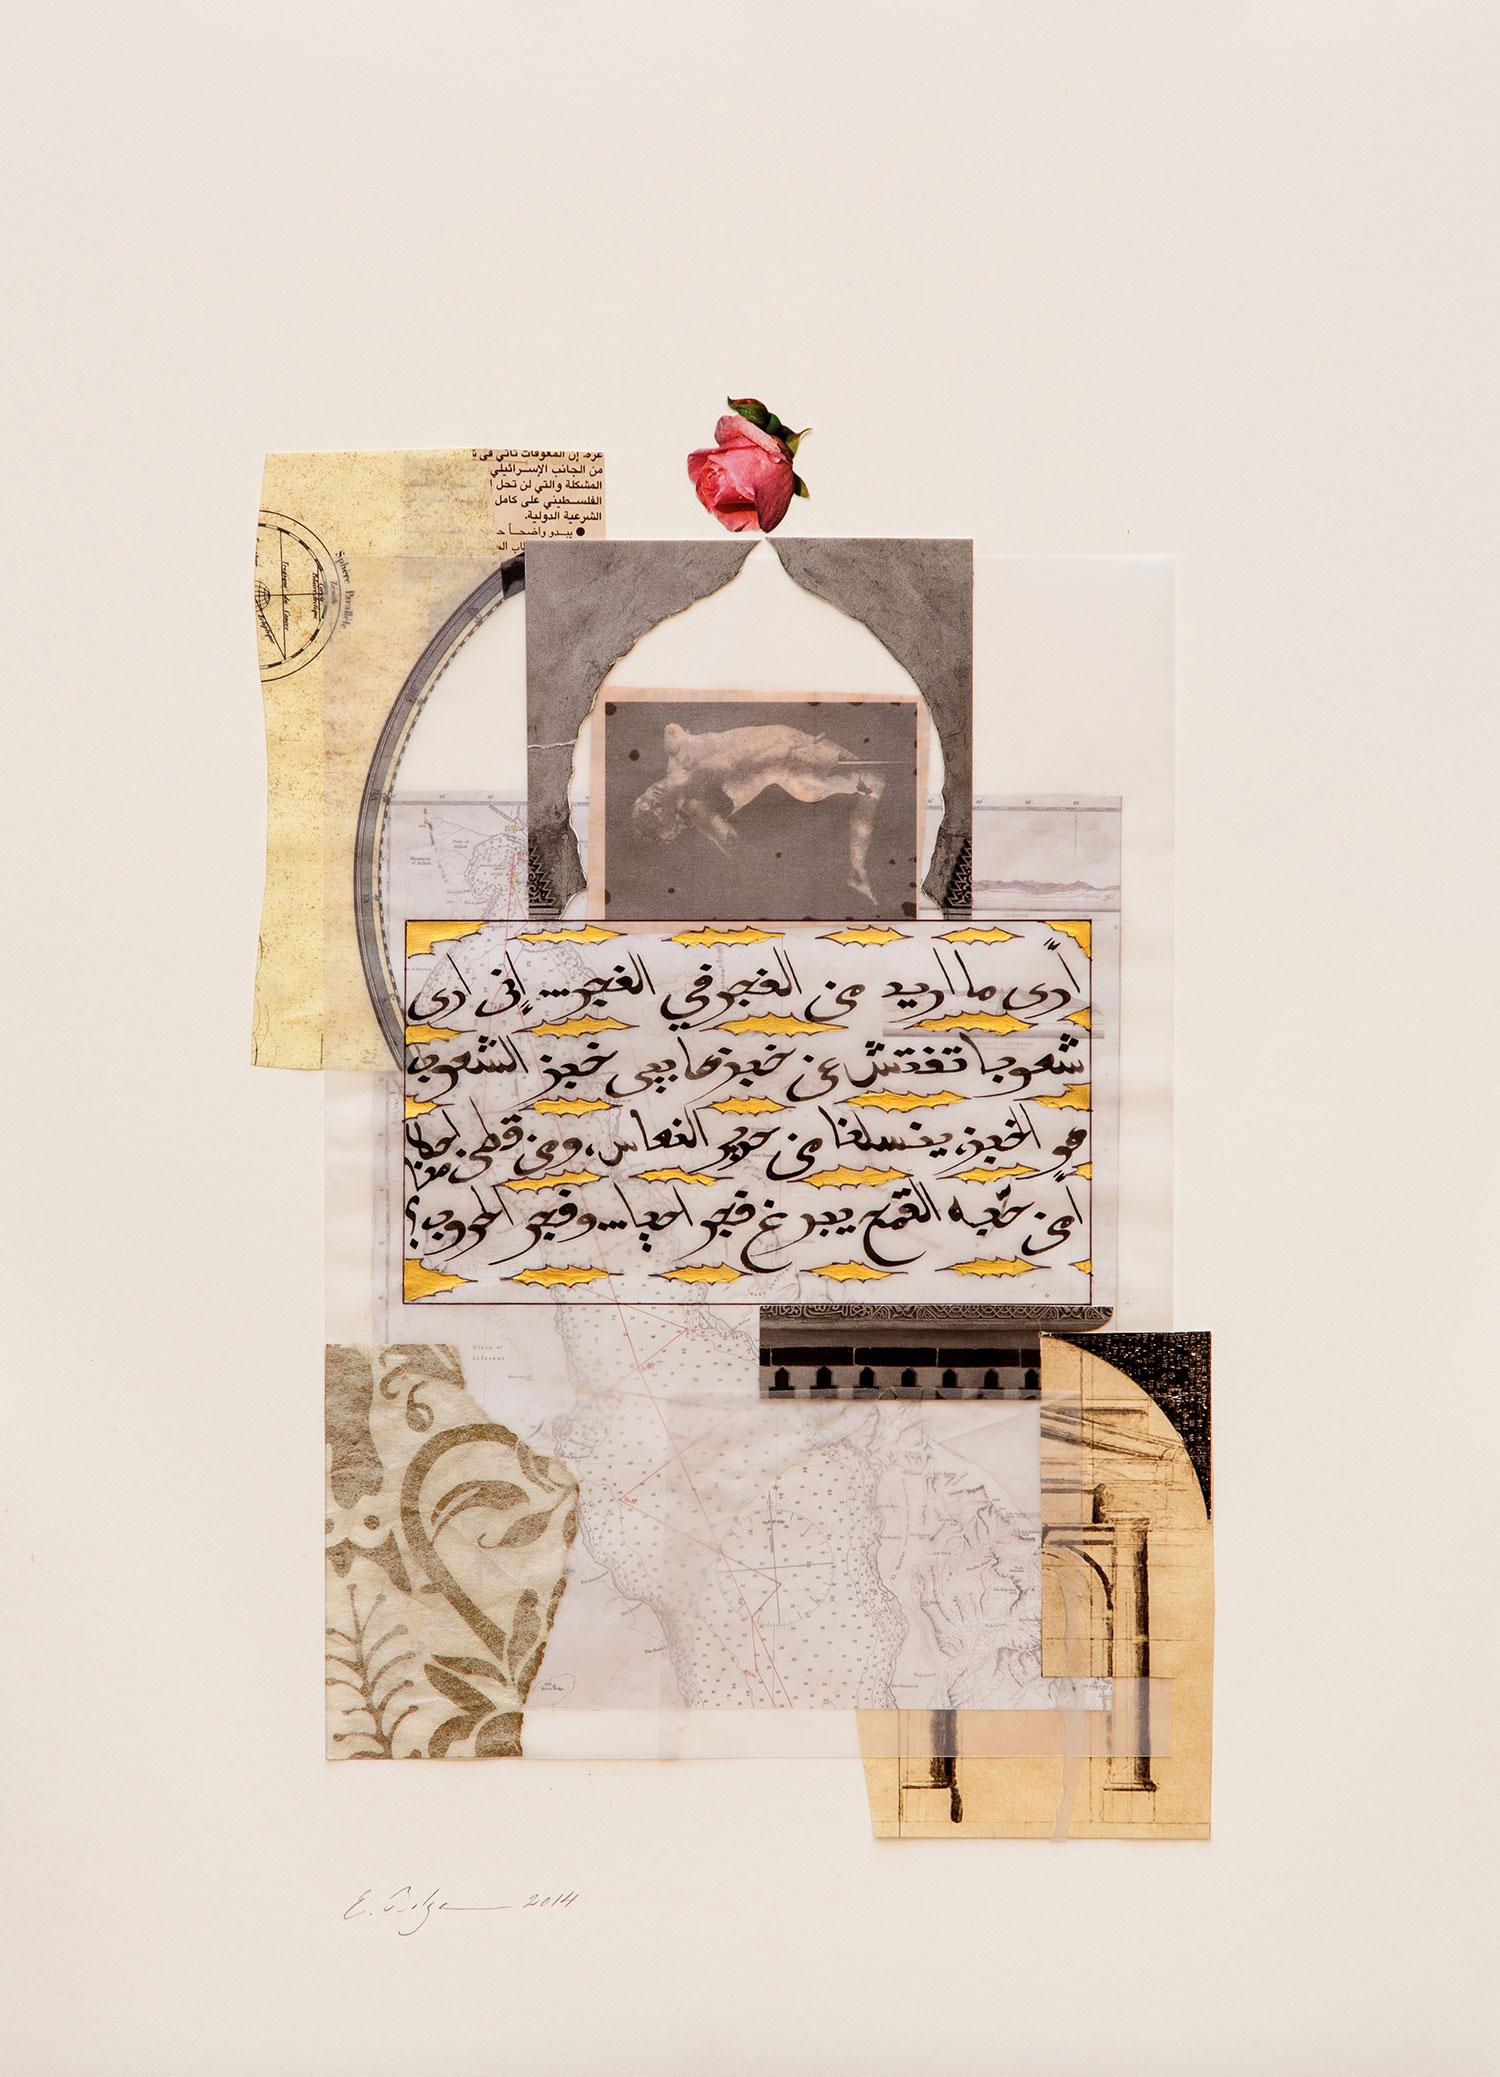 Rubayat (Mahmoud Darwish) XIV  Paper, Iranian ink and gold on paper 53 x 38 cm 2014